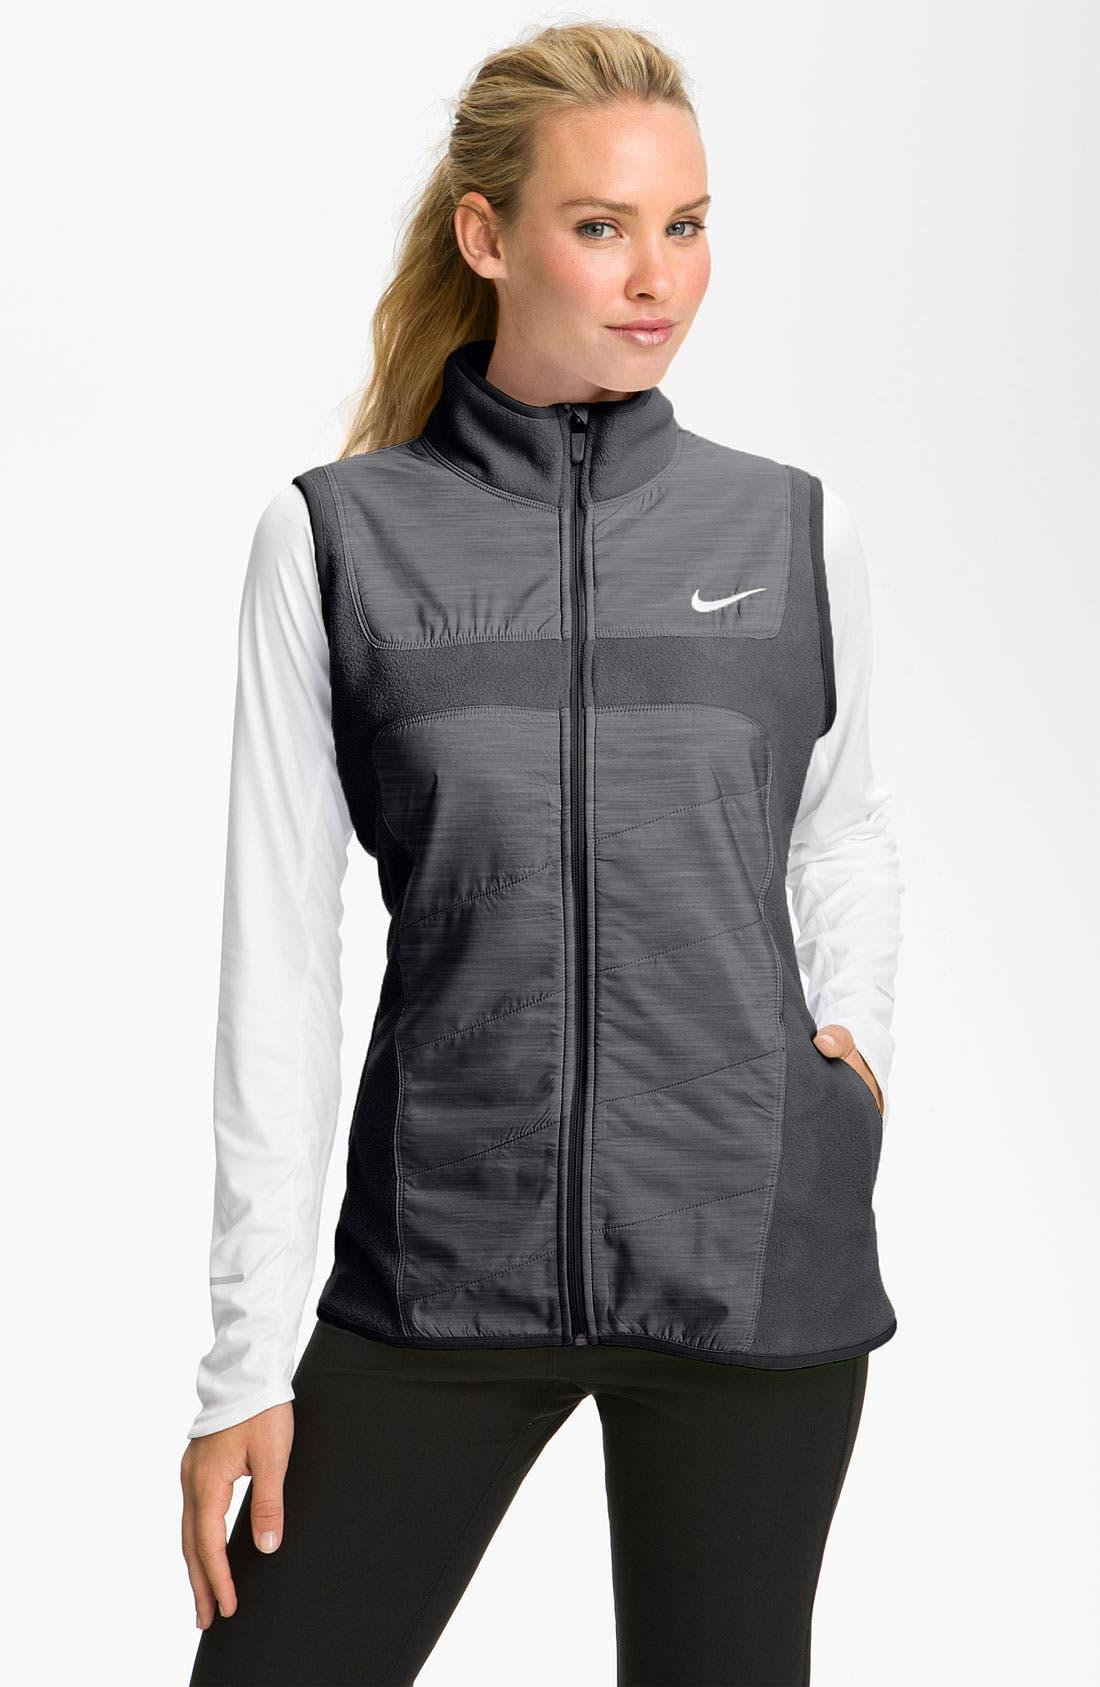 Alternate Image 1 Selected - Nike 'Habitat' Vest